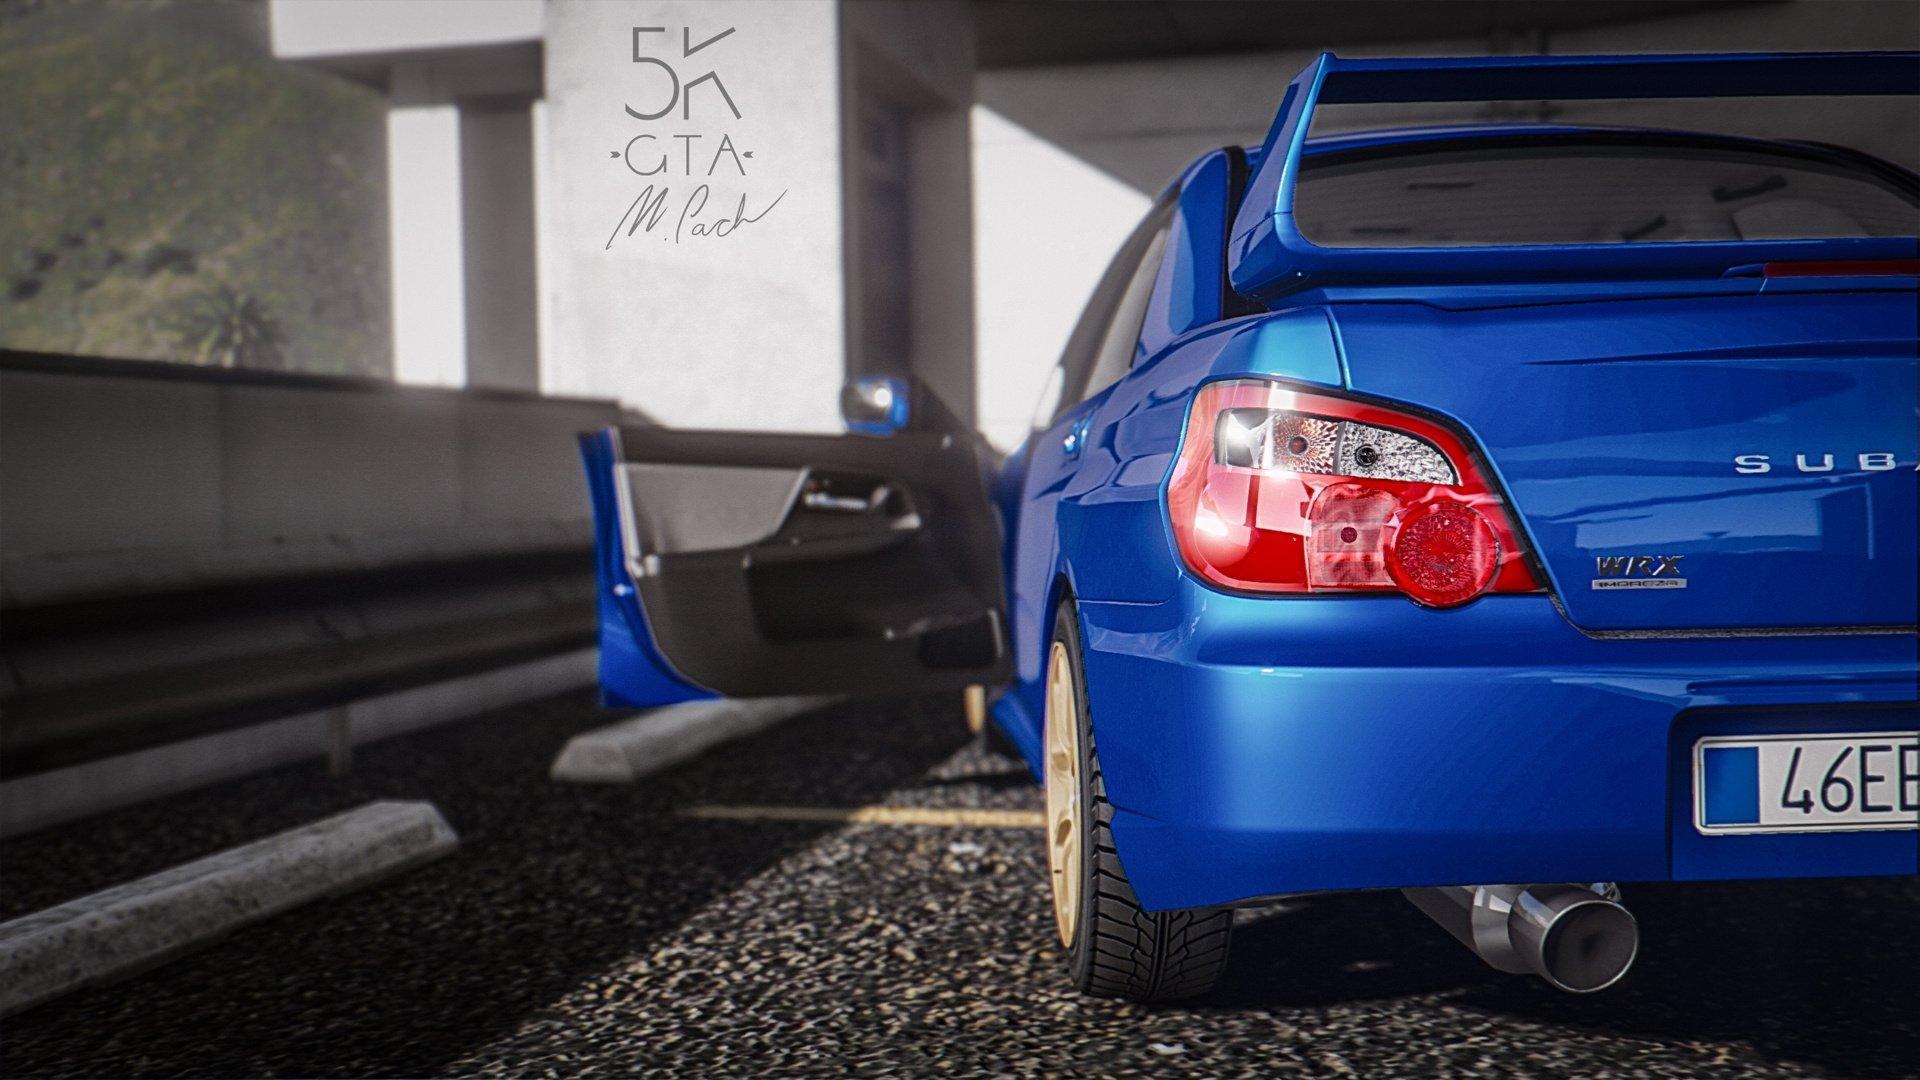 Subaru impreza wrx sti 2004 add on tuning gta5 mods 569d90 balksz 3 vanachro Choice Image